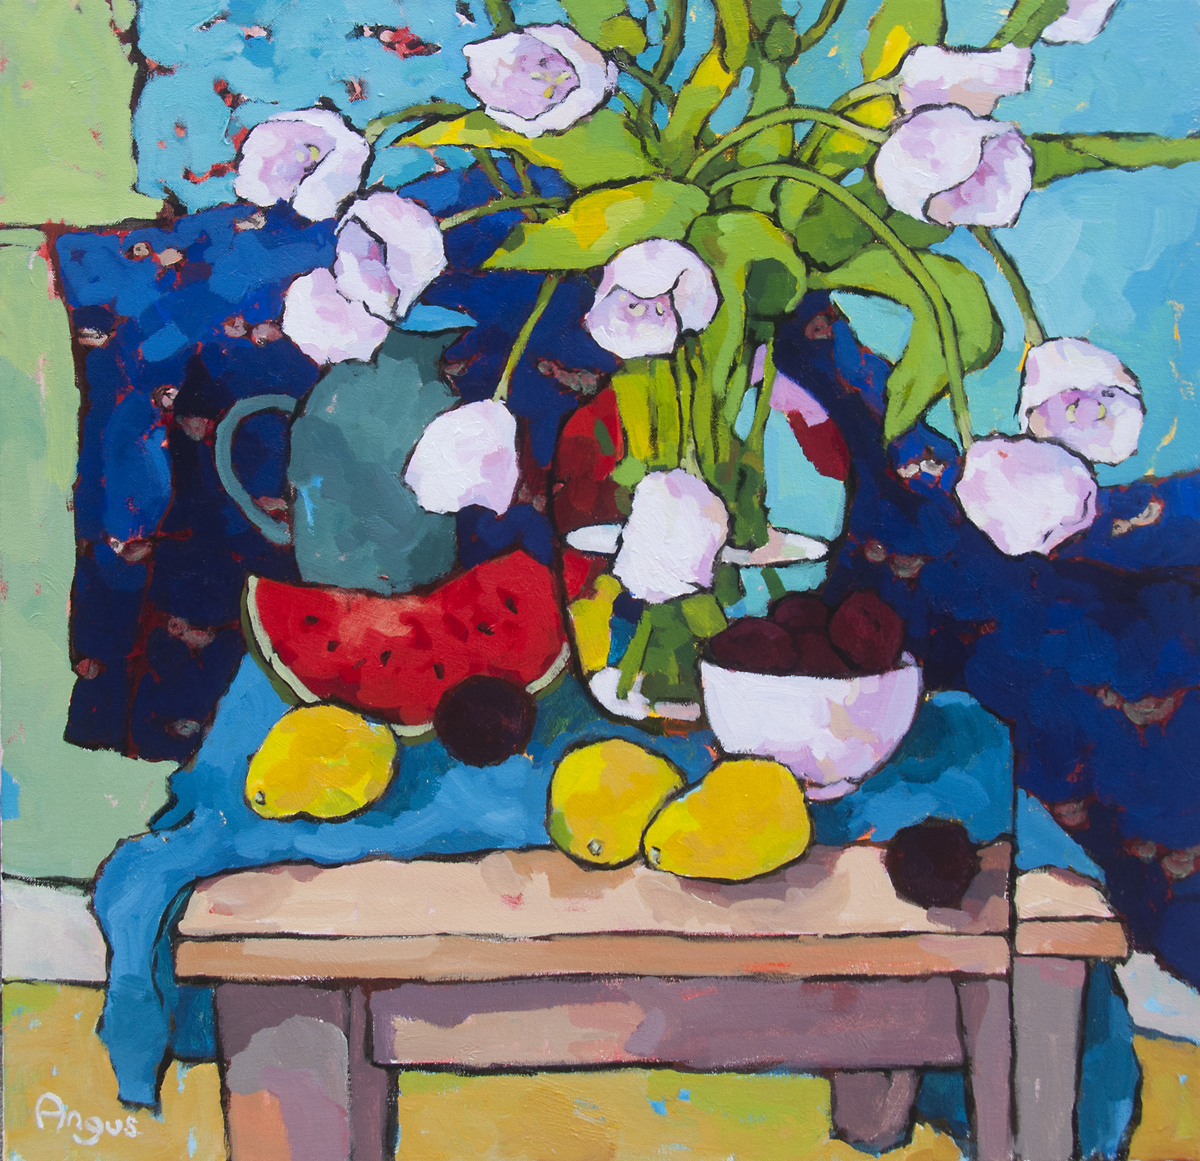 Angus - Tulips & Papaya with blue